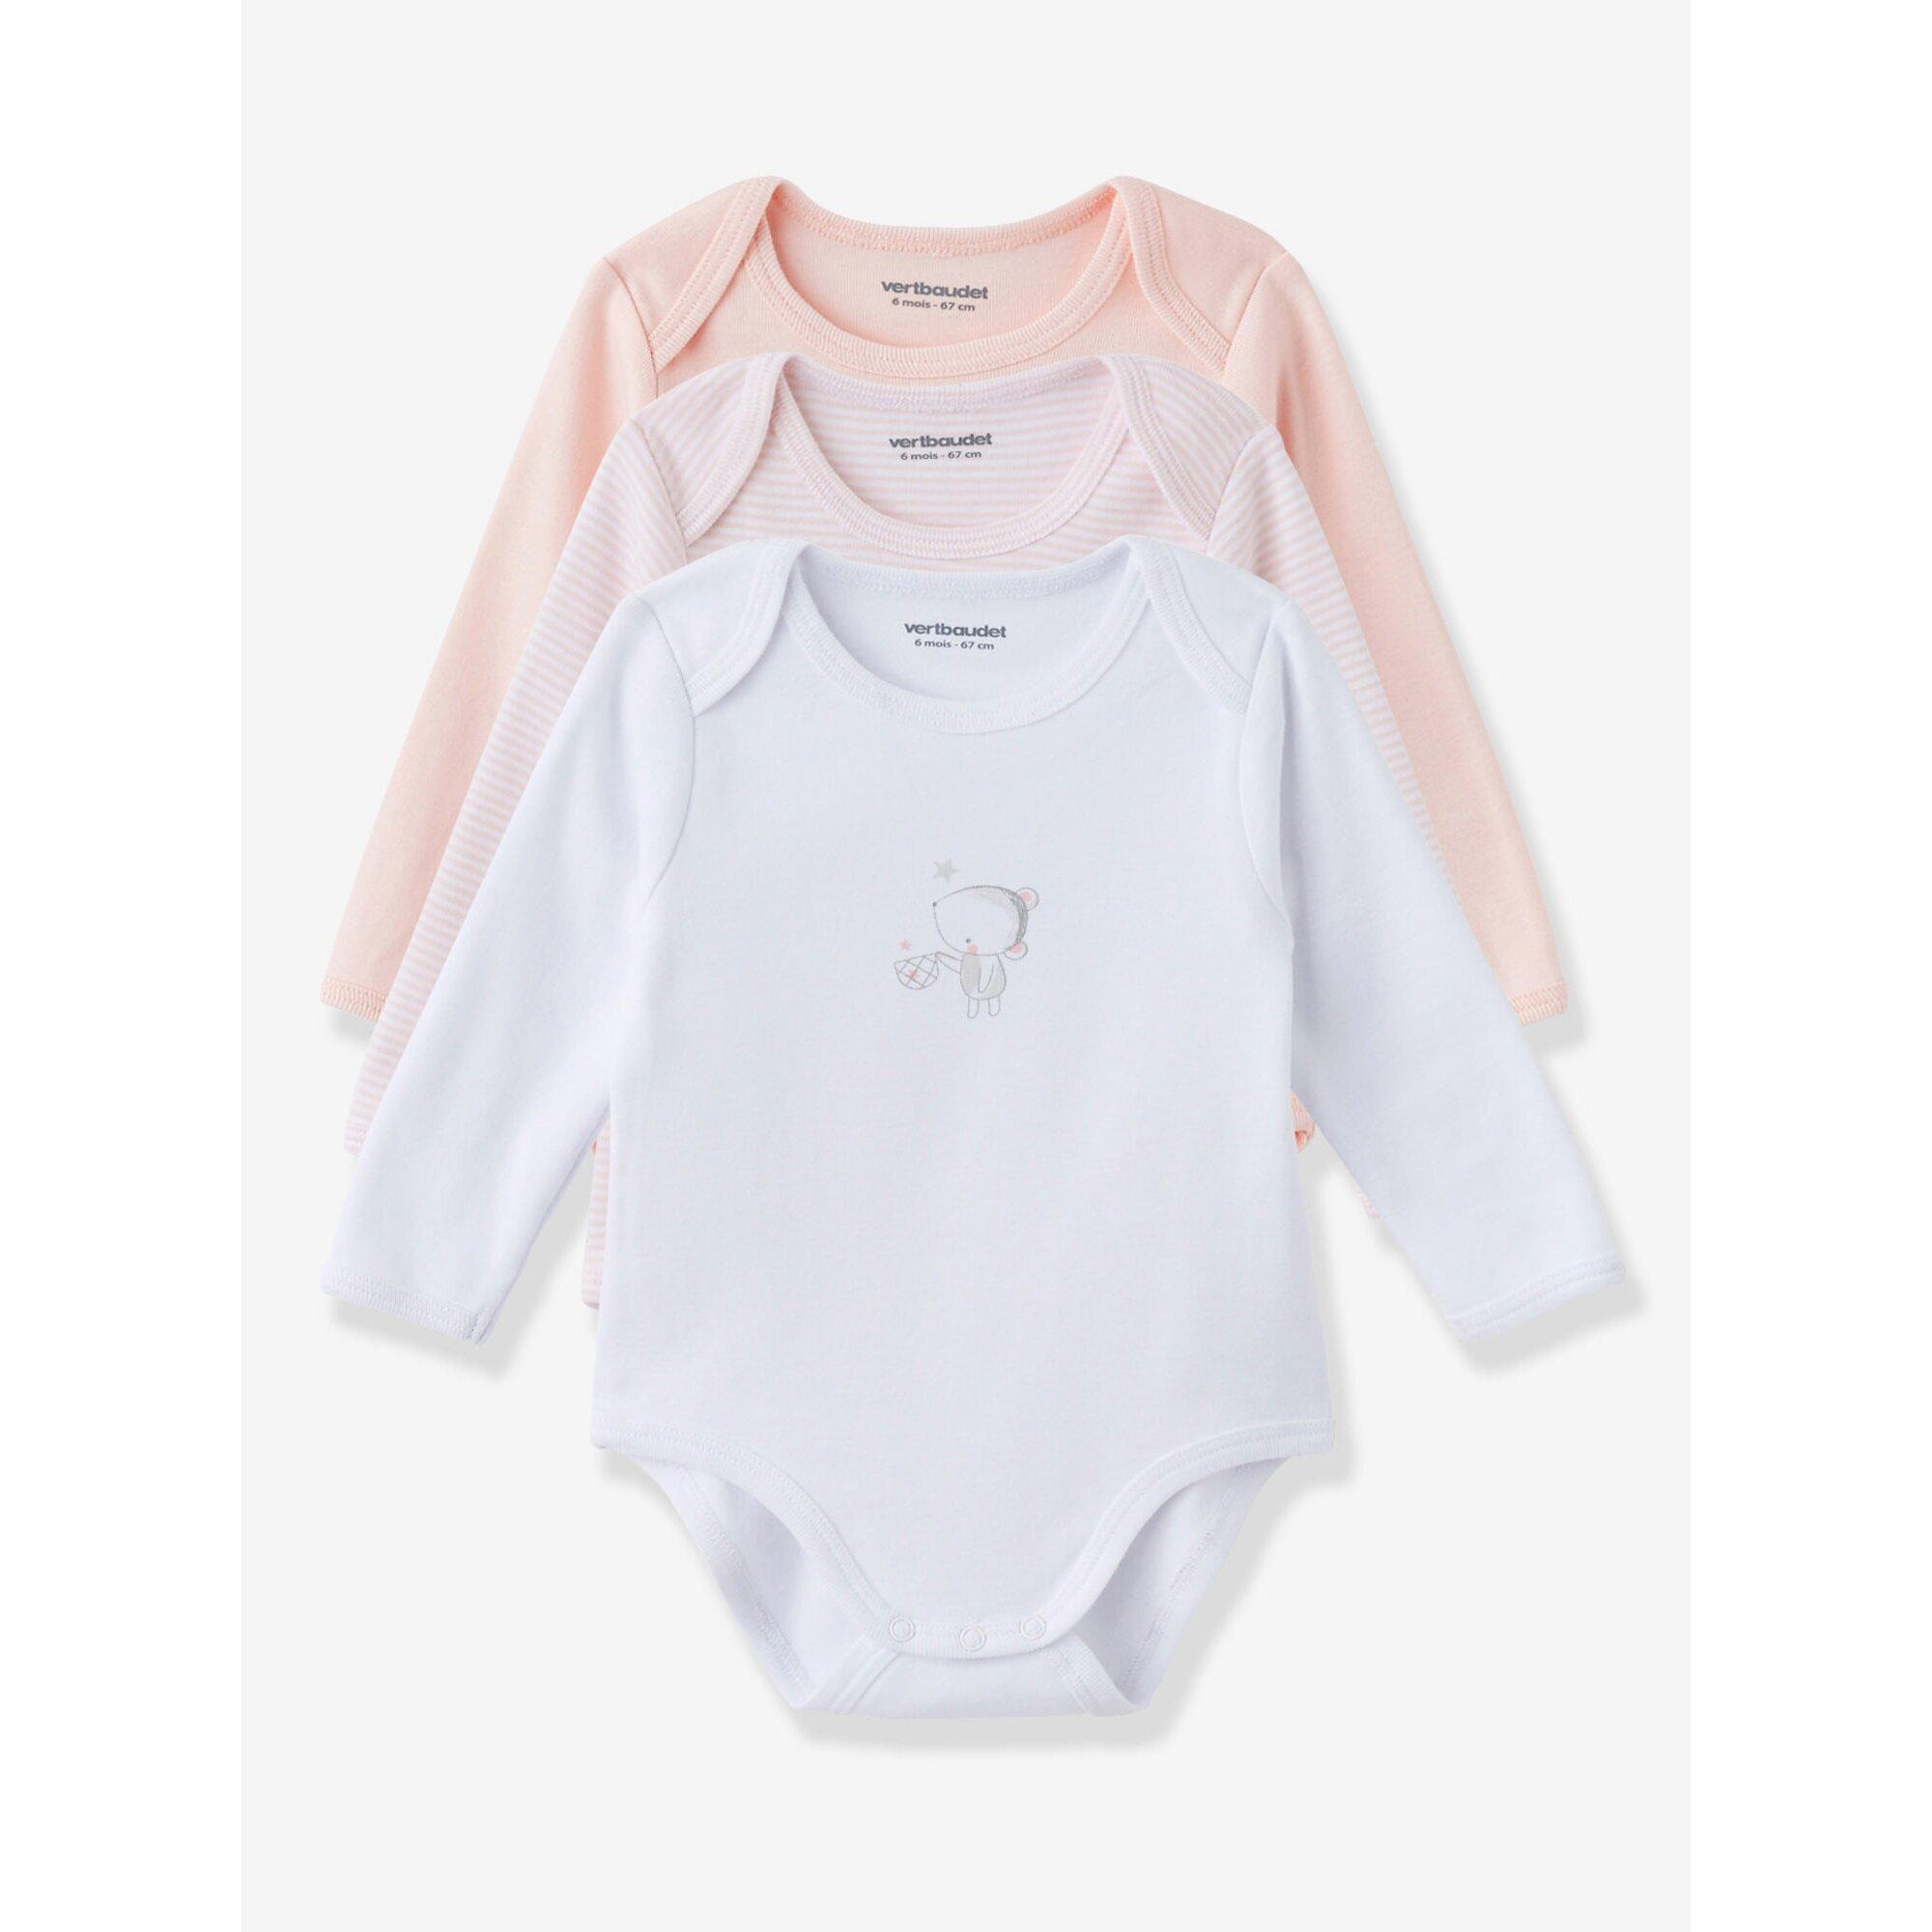 vertbaudet-happy-price-3er-pack-baby-bodys-langarm